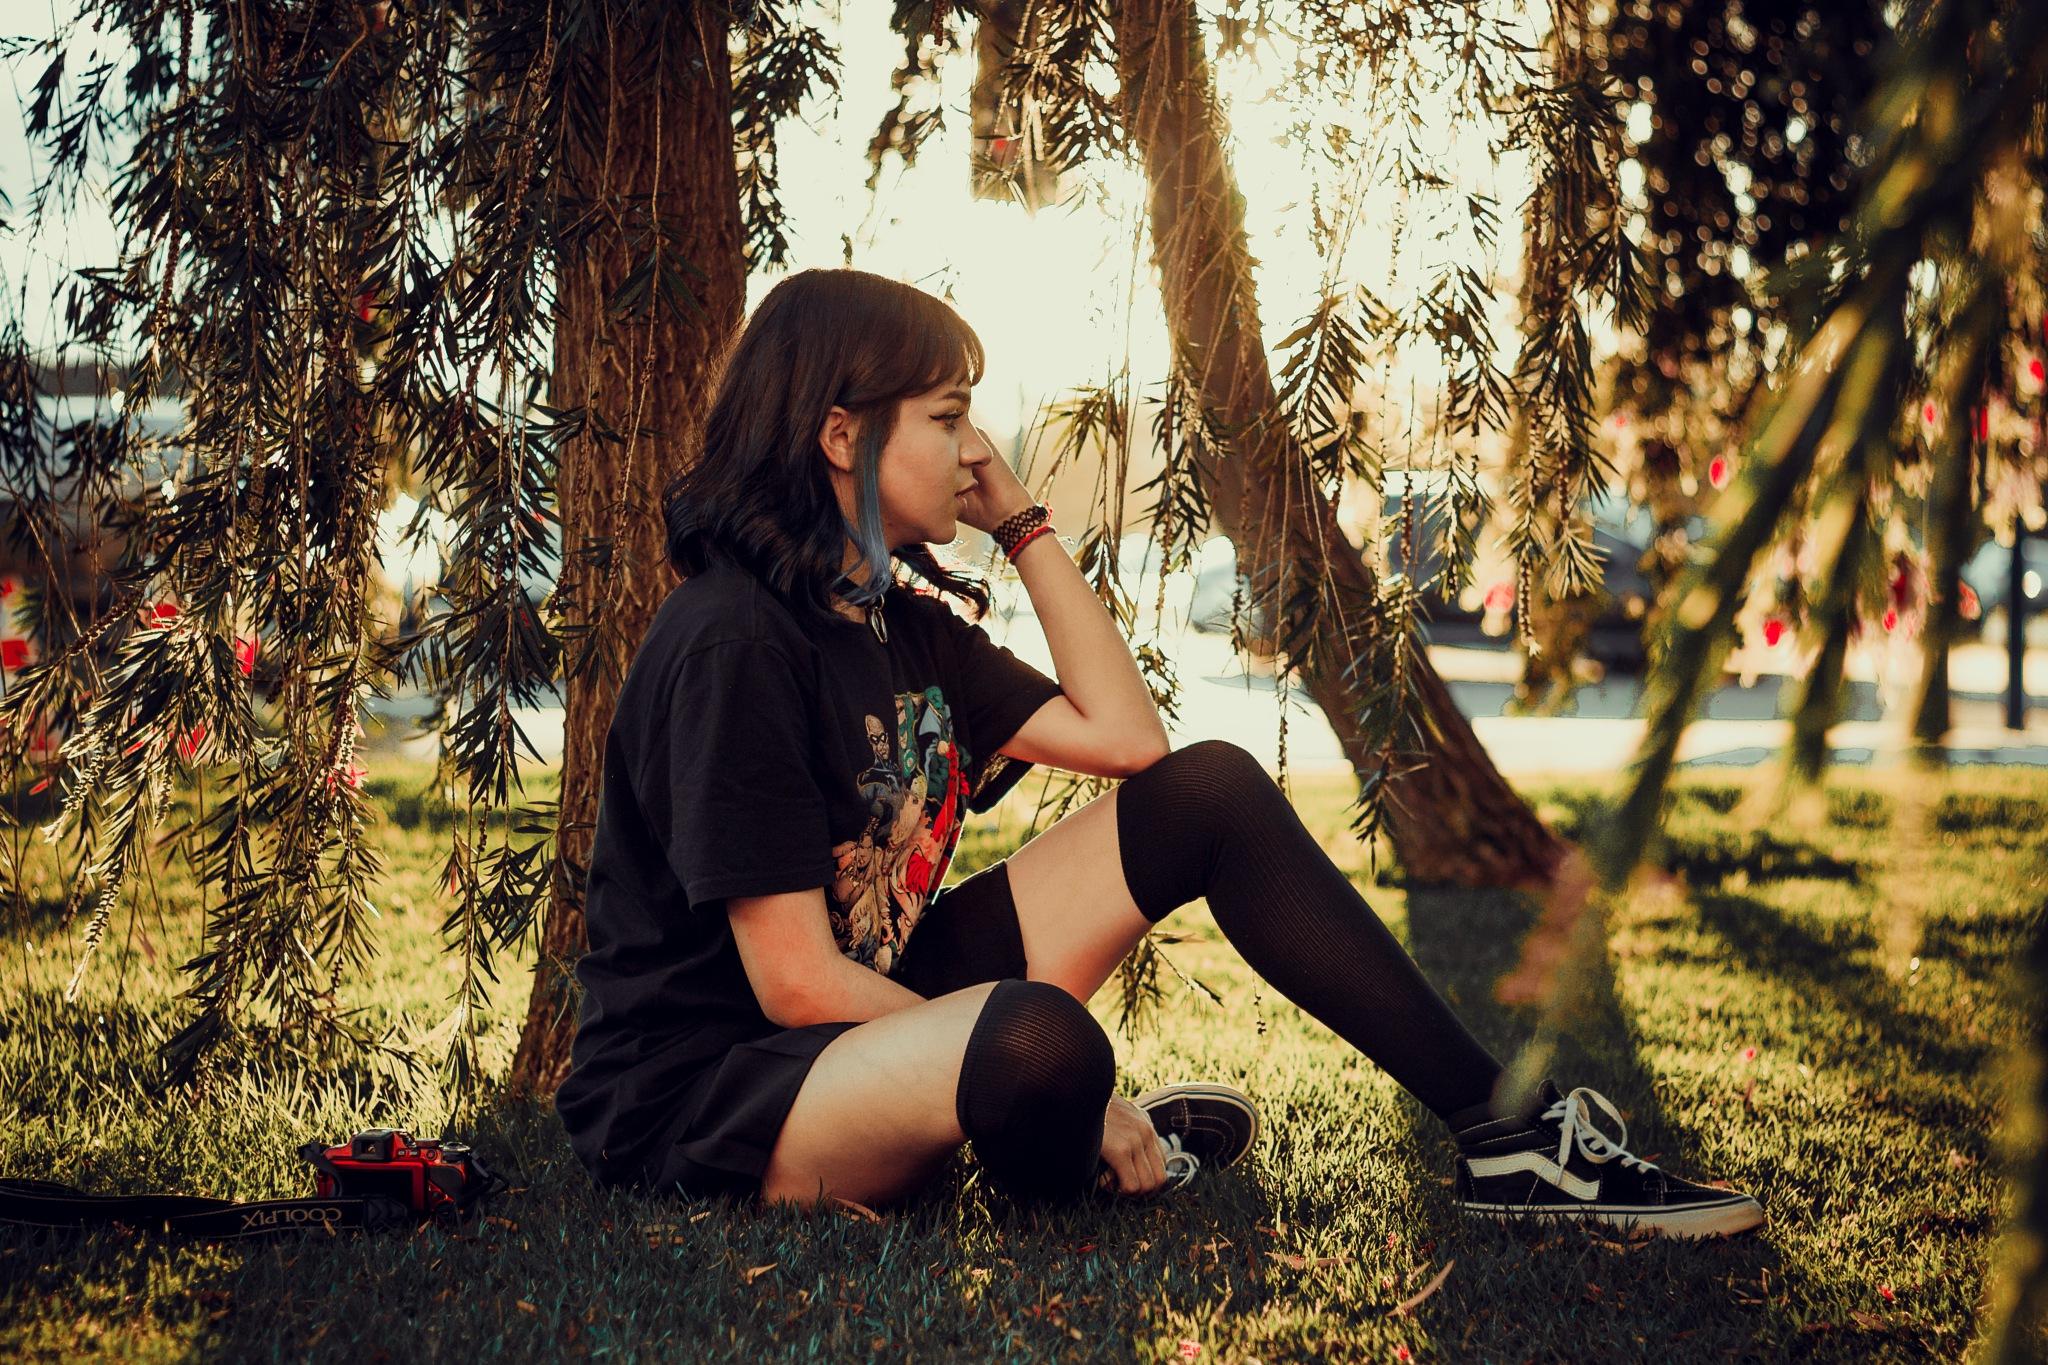 Haru by Sad Young